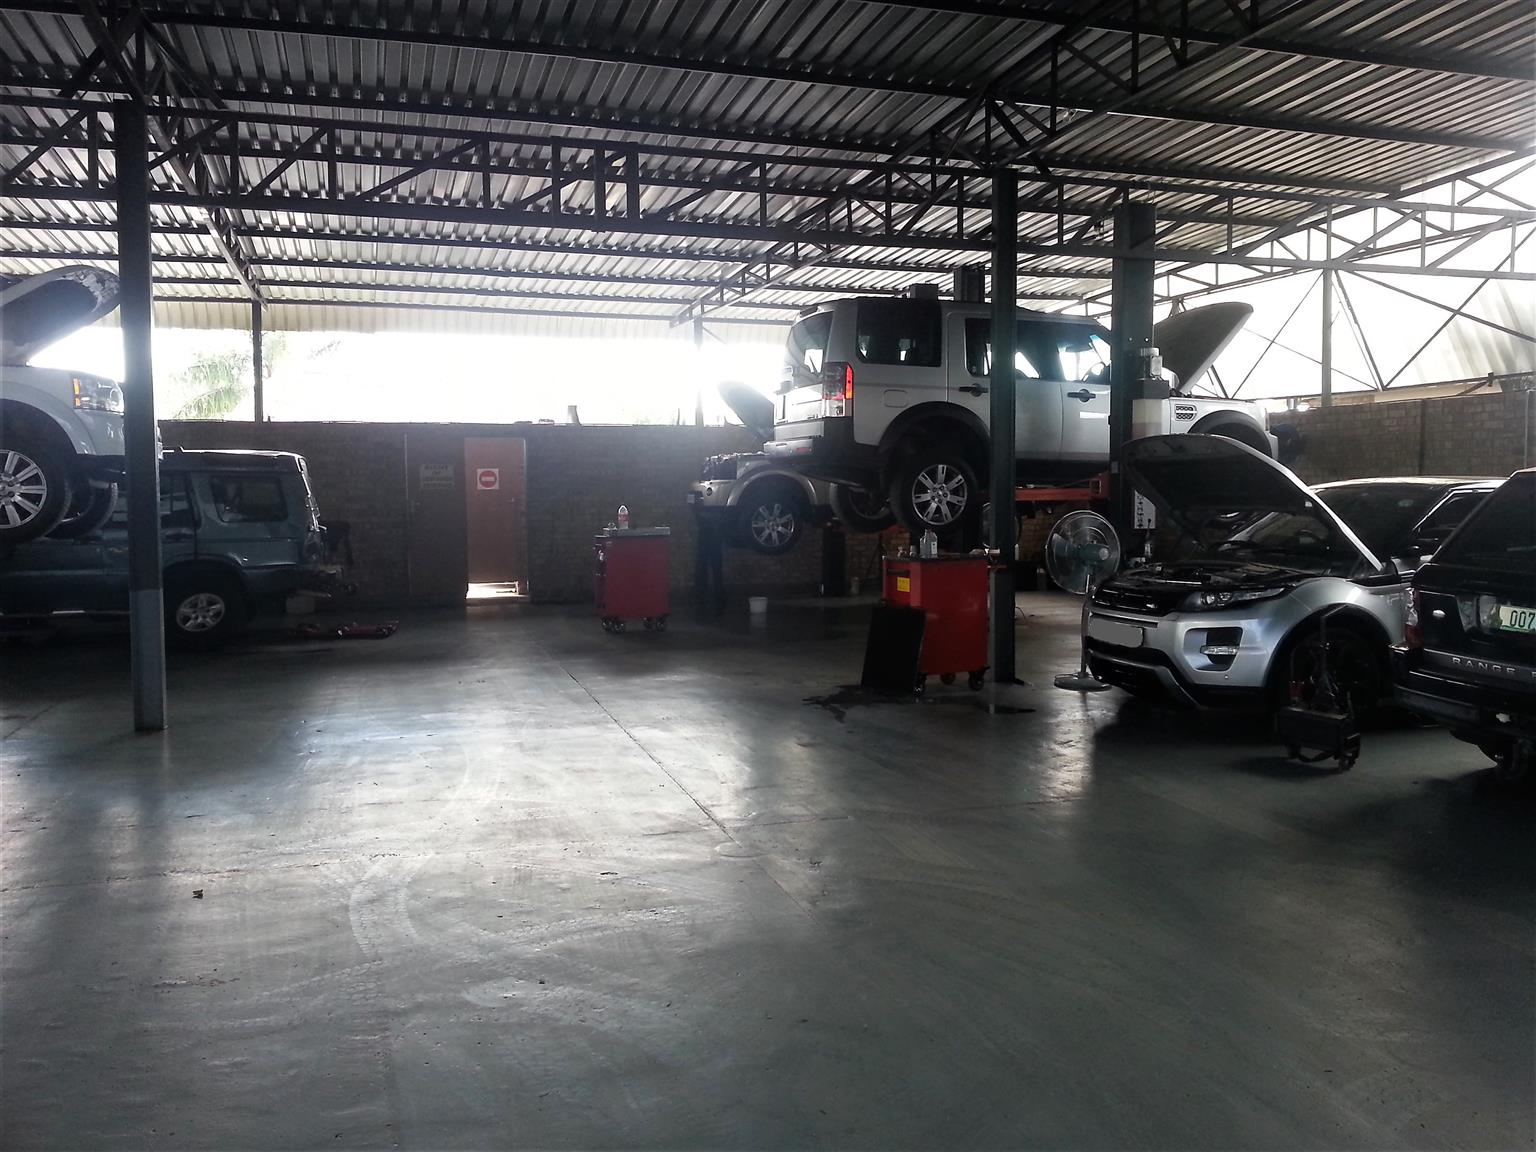 Land Rover Workshop - Service & Repair